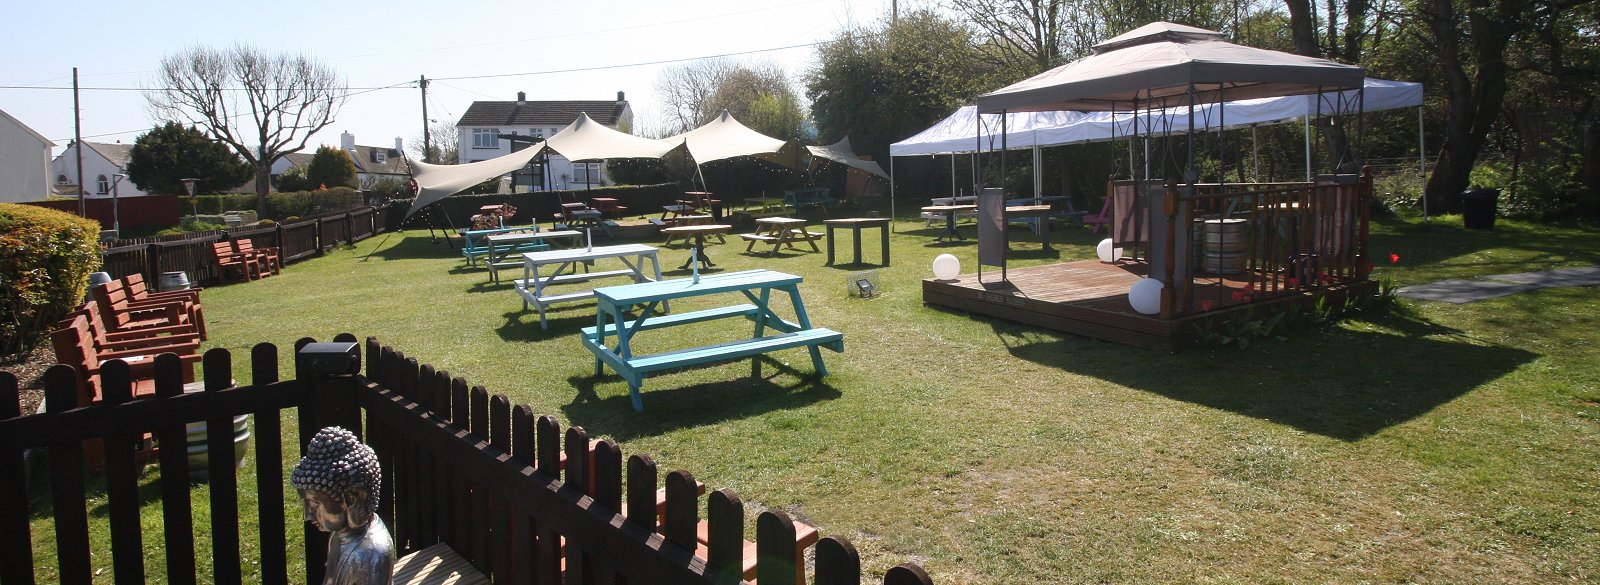 Fox & Hounds pub food, Swindon